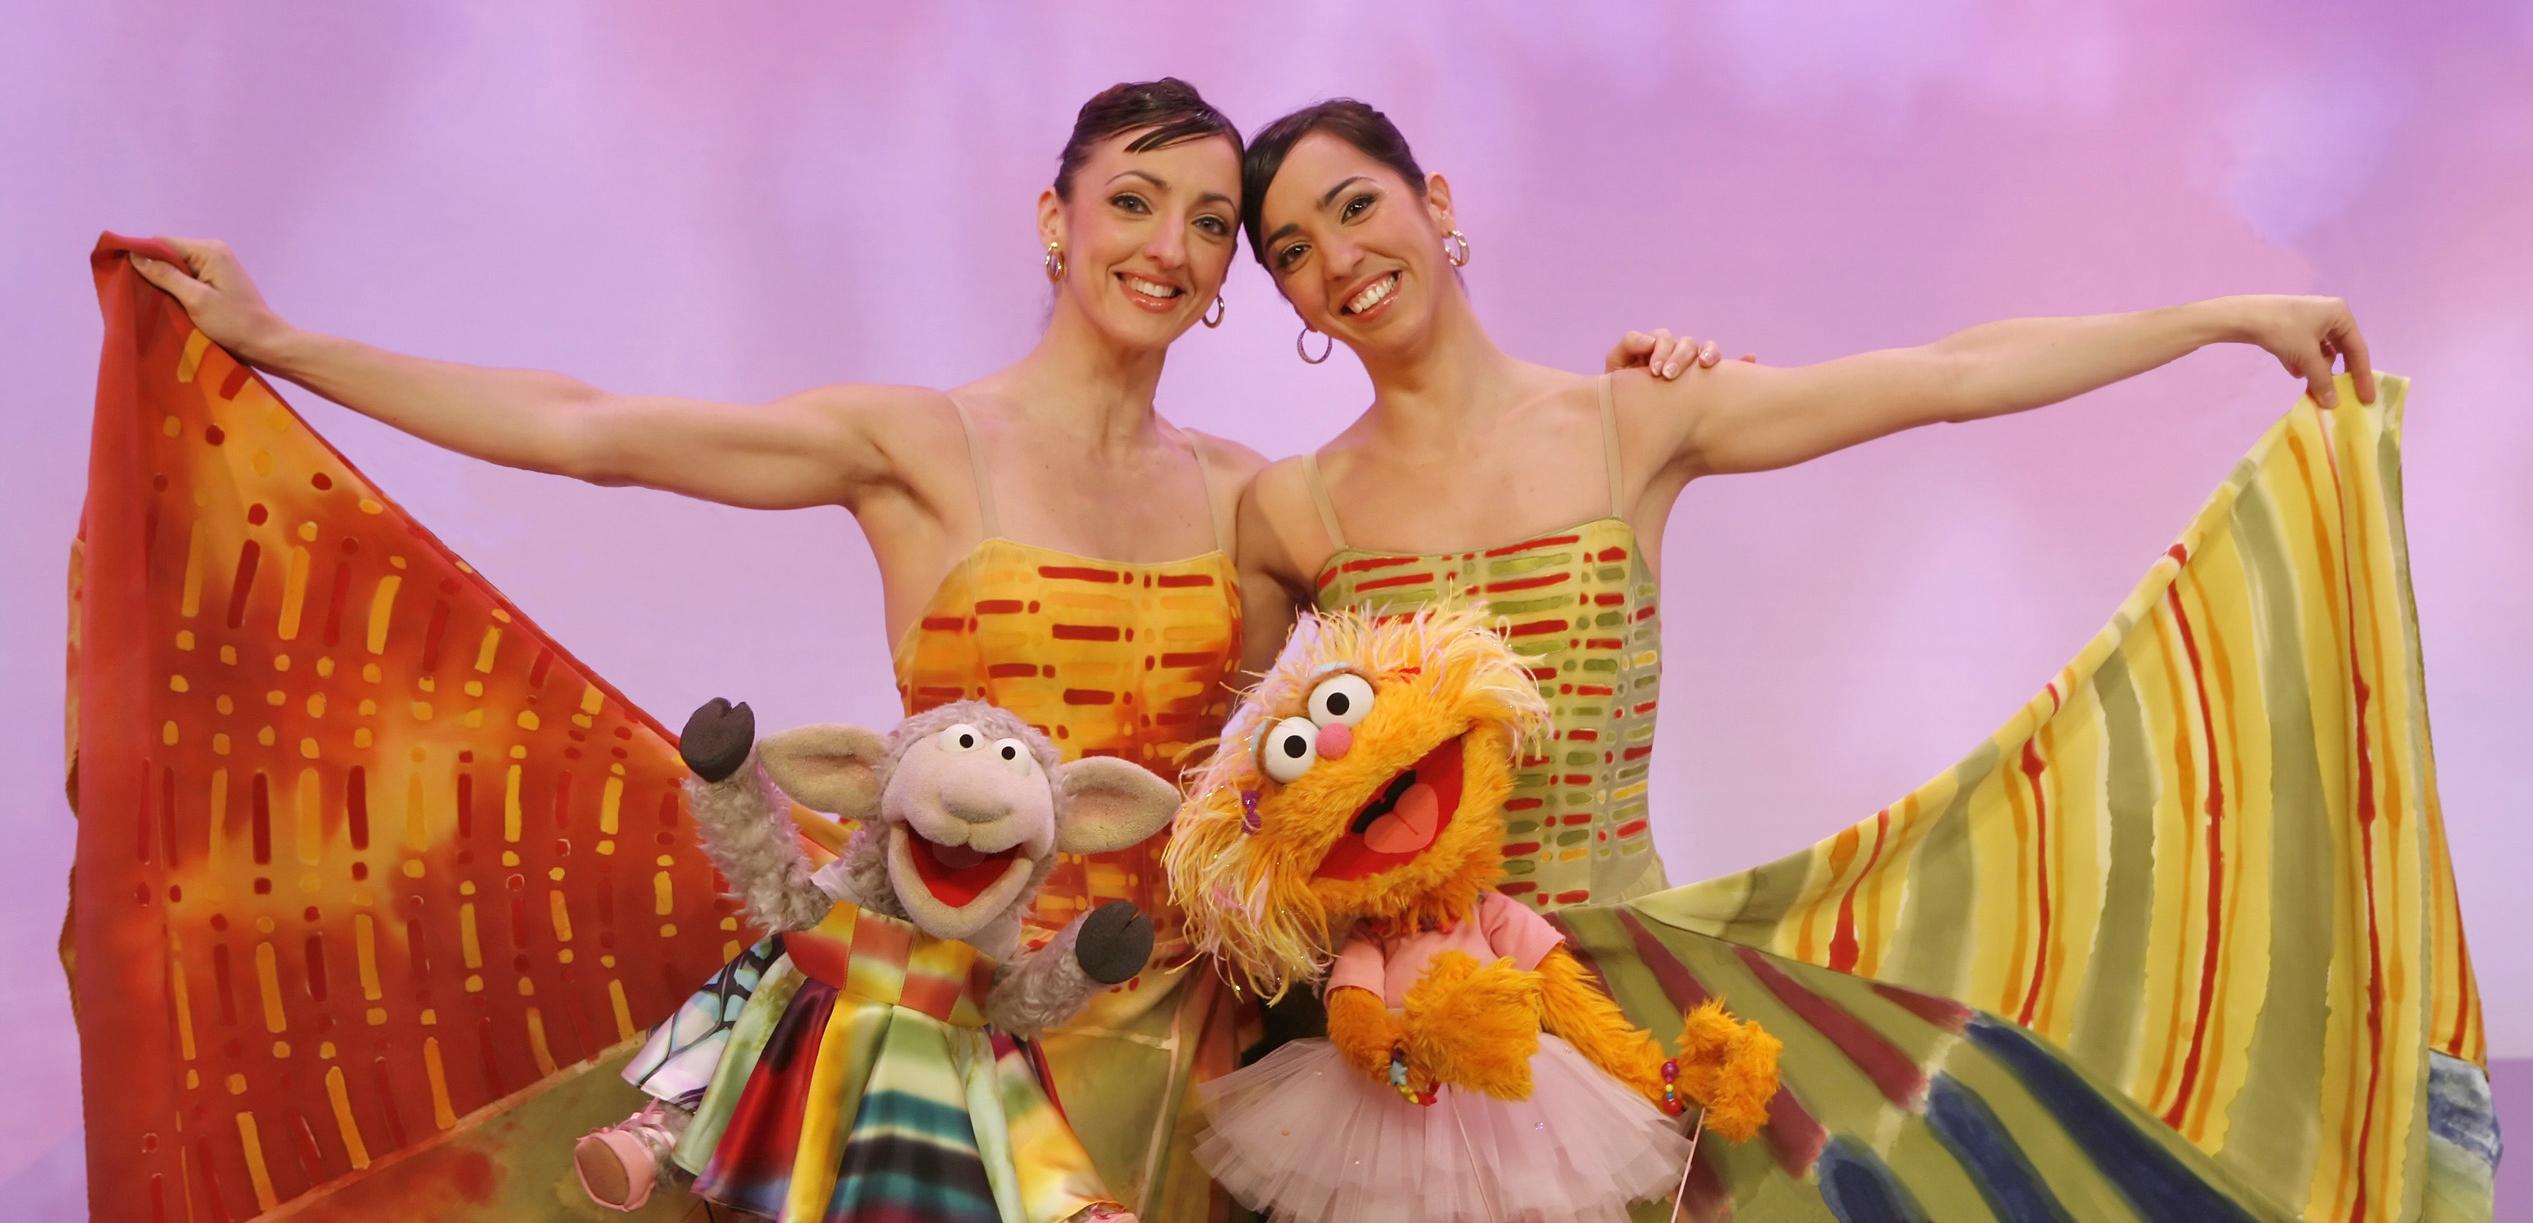 File:Feijoo-Ballerinas.jpg